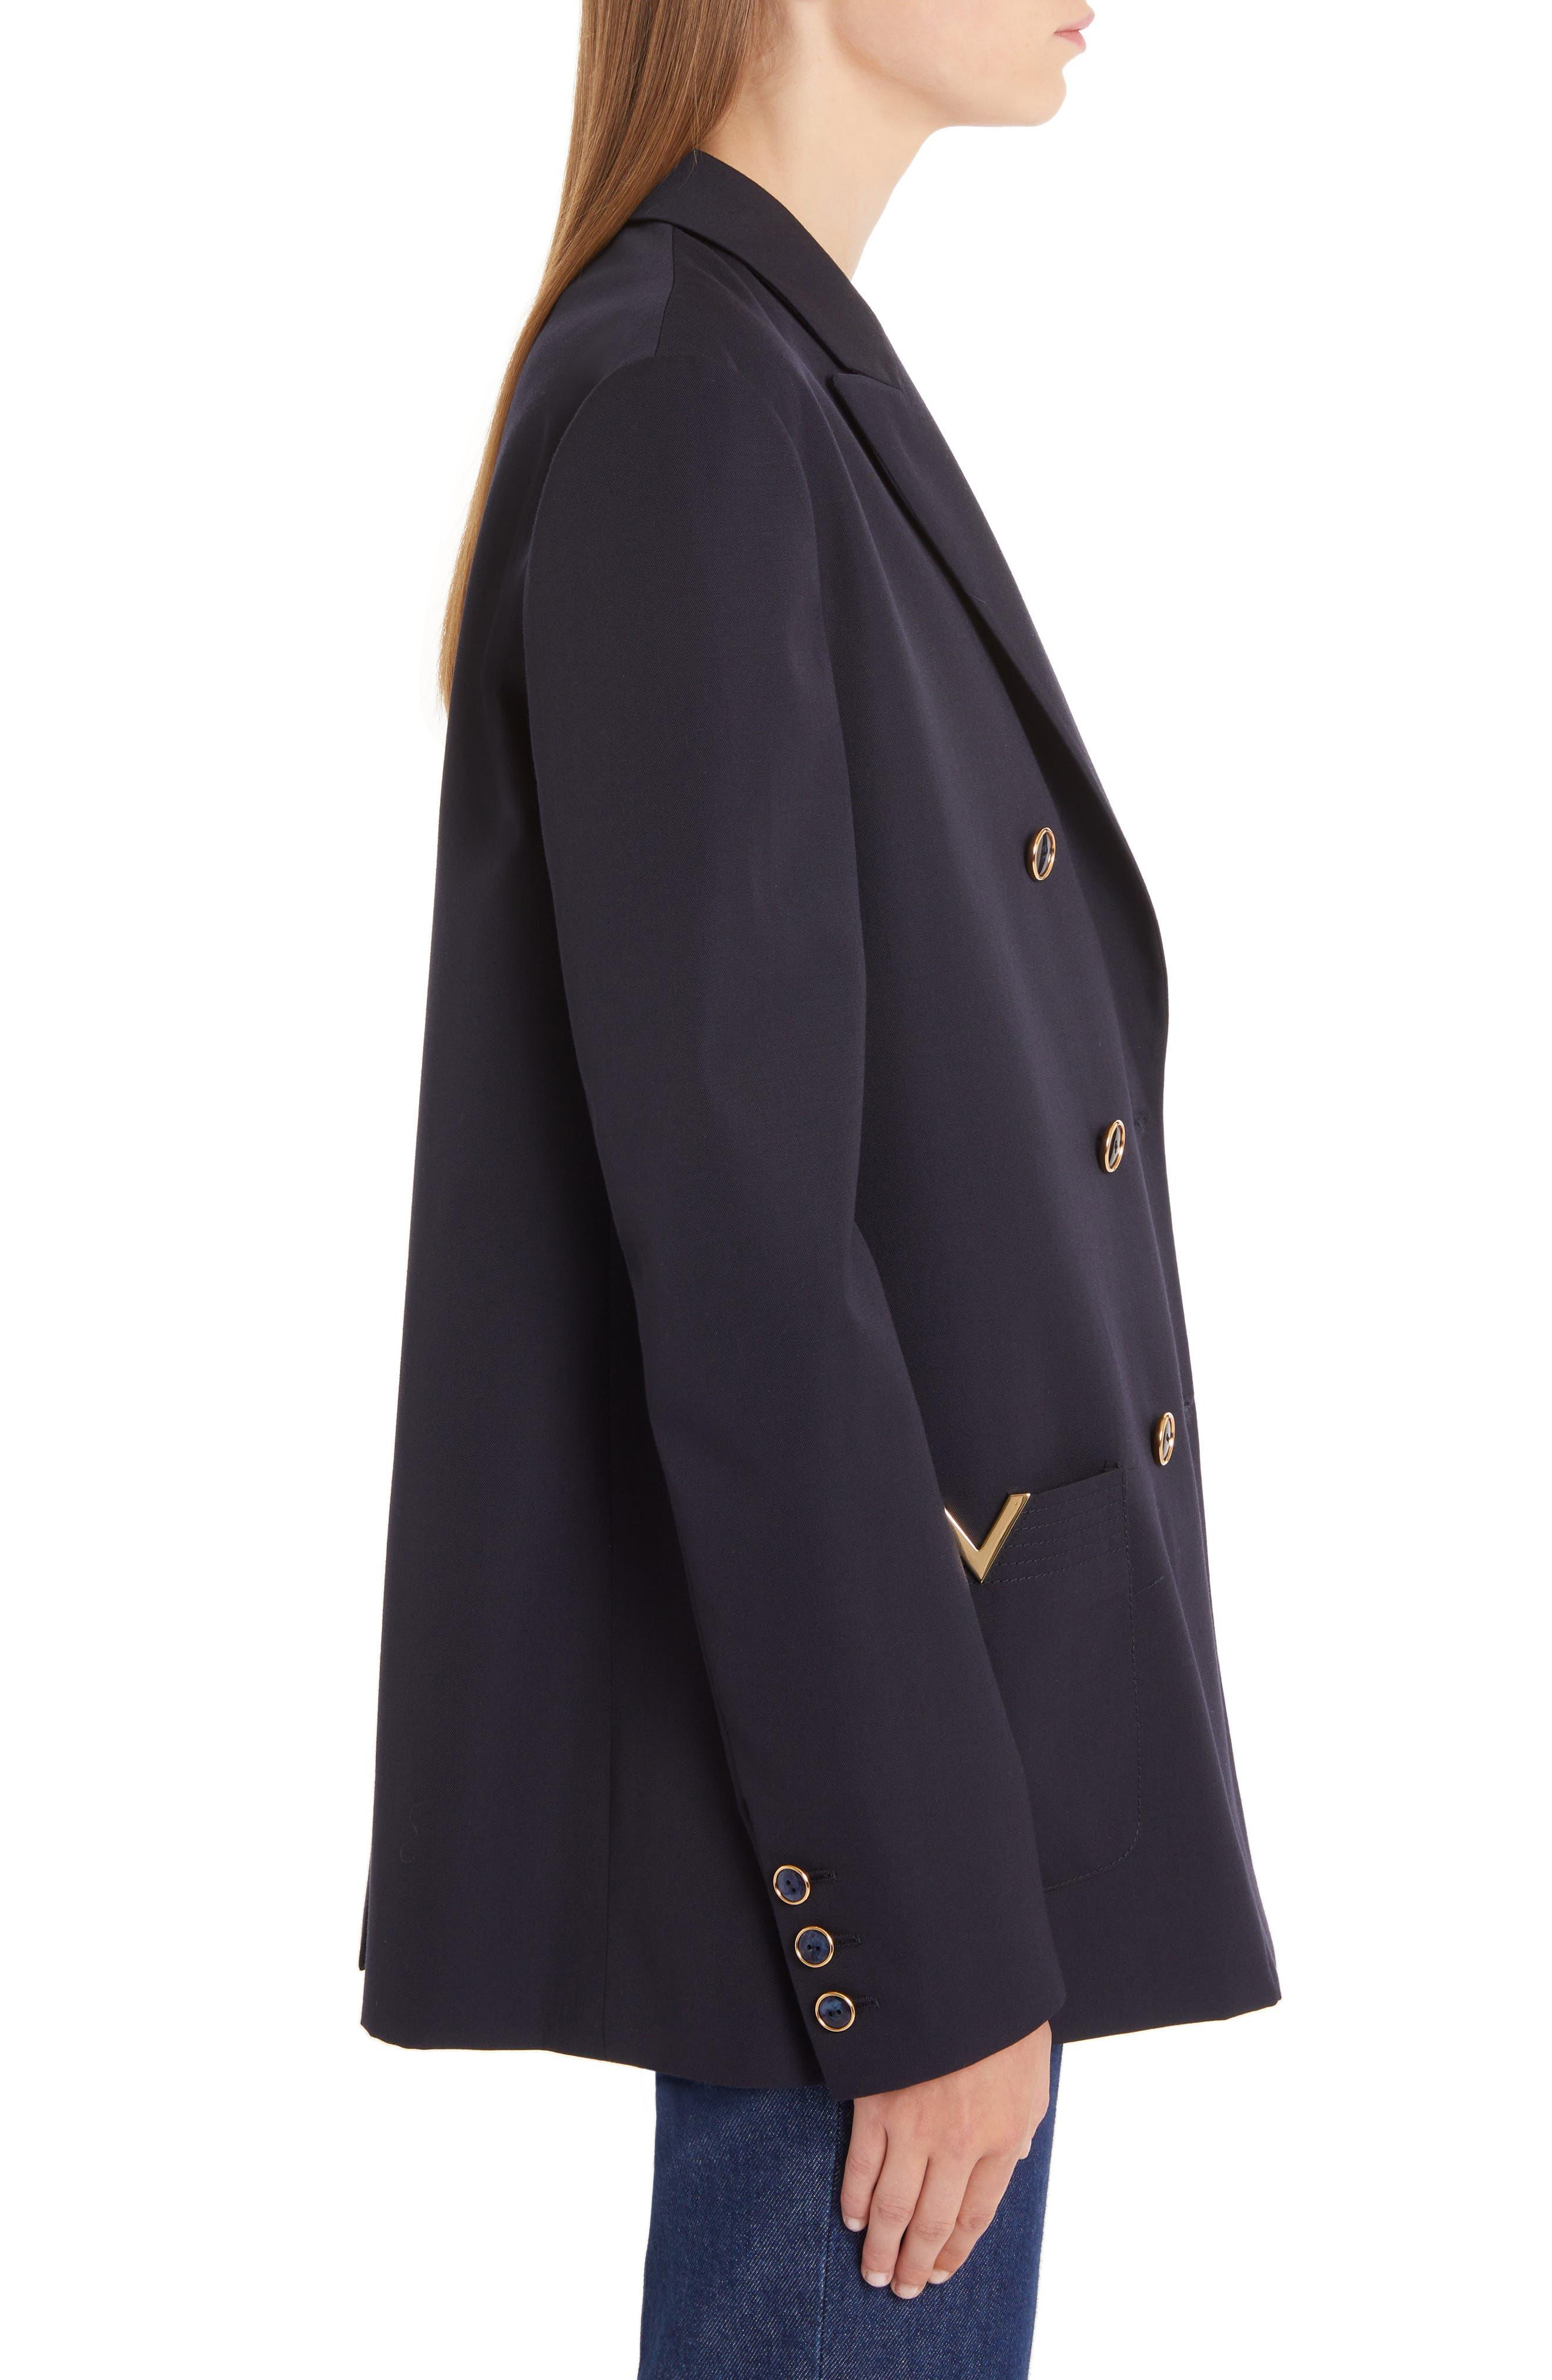 VALENTINO, V-Detail Wool Gabardine Jacket, Alternate thumbnail 3, color, NAVY